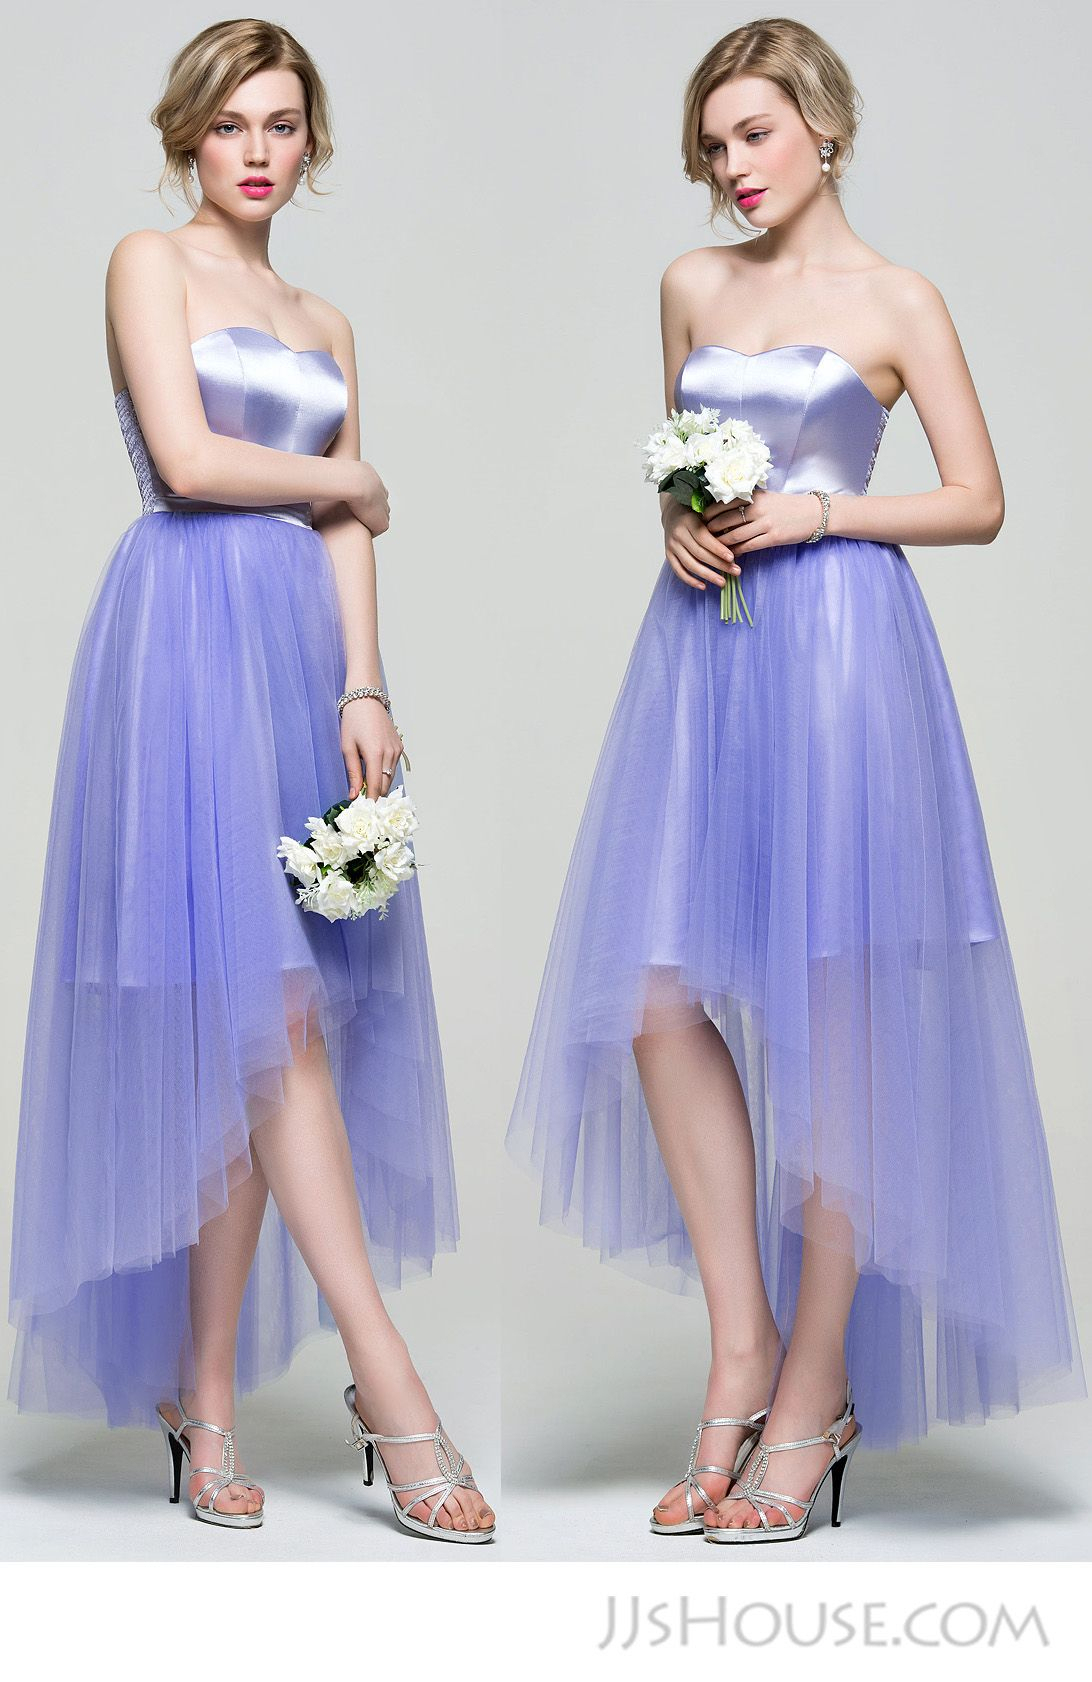 Asymmetrical bridesmaid dress. ##JJsHouse #JJsHouseBridesmaidDress ...